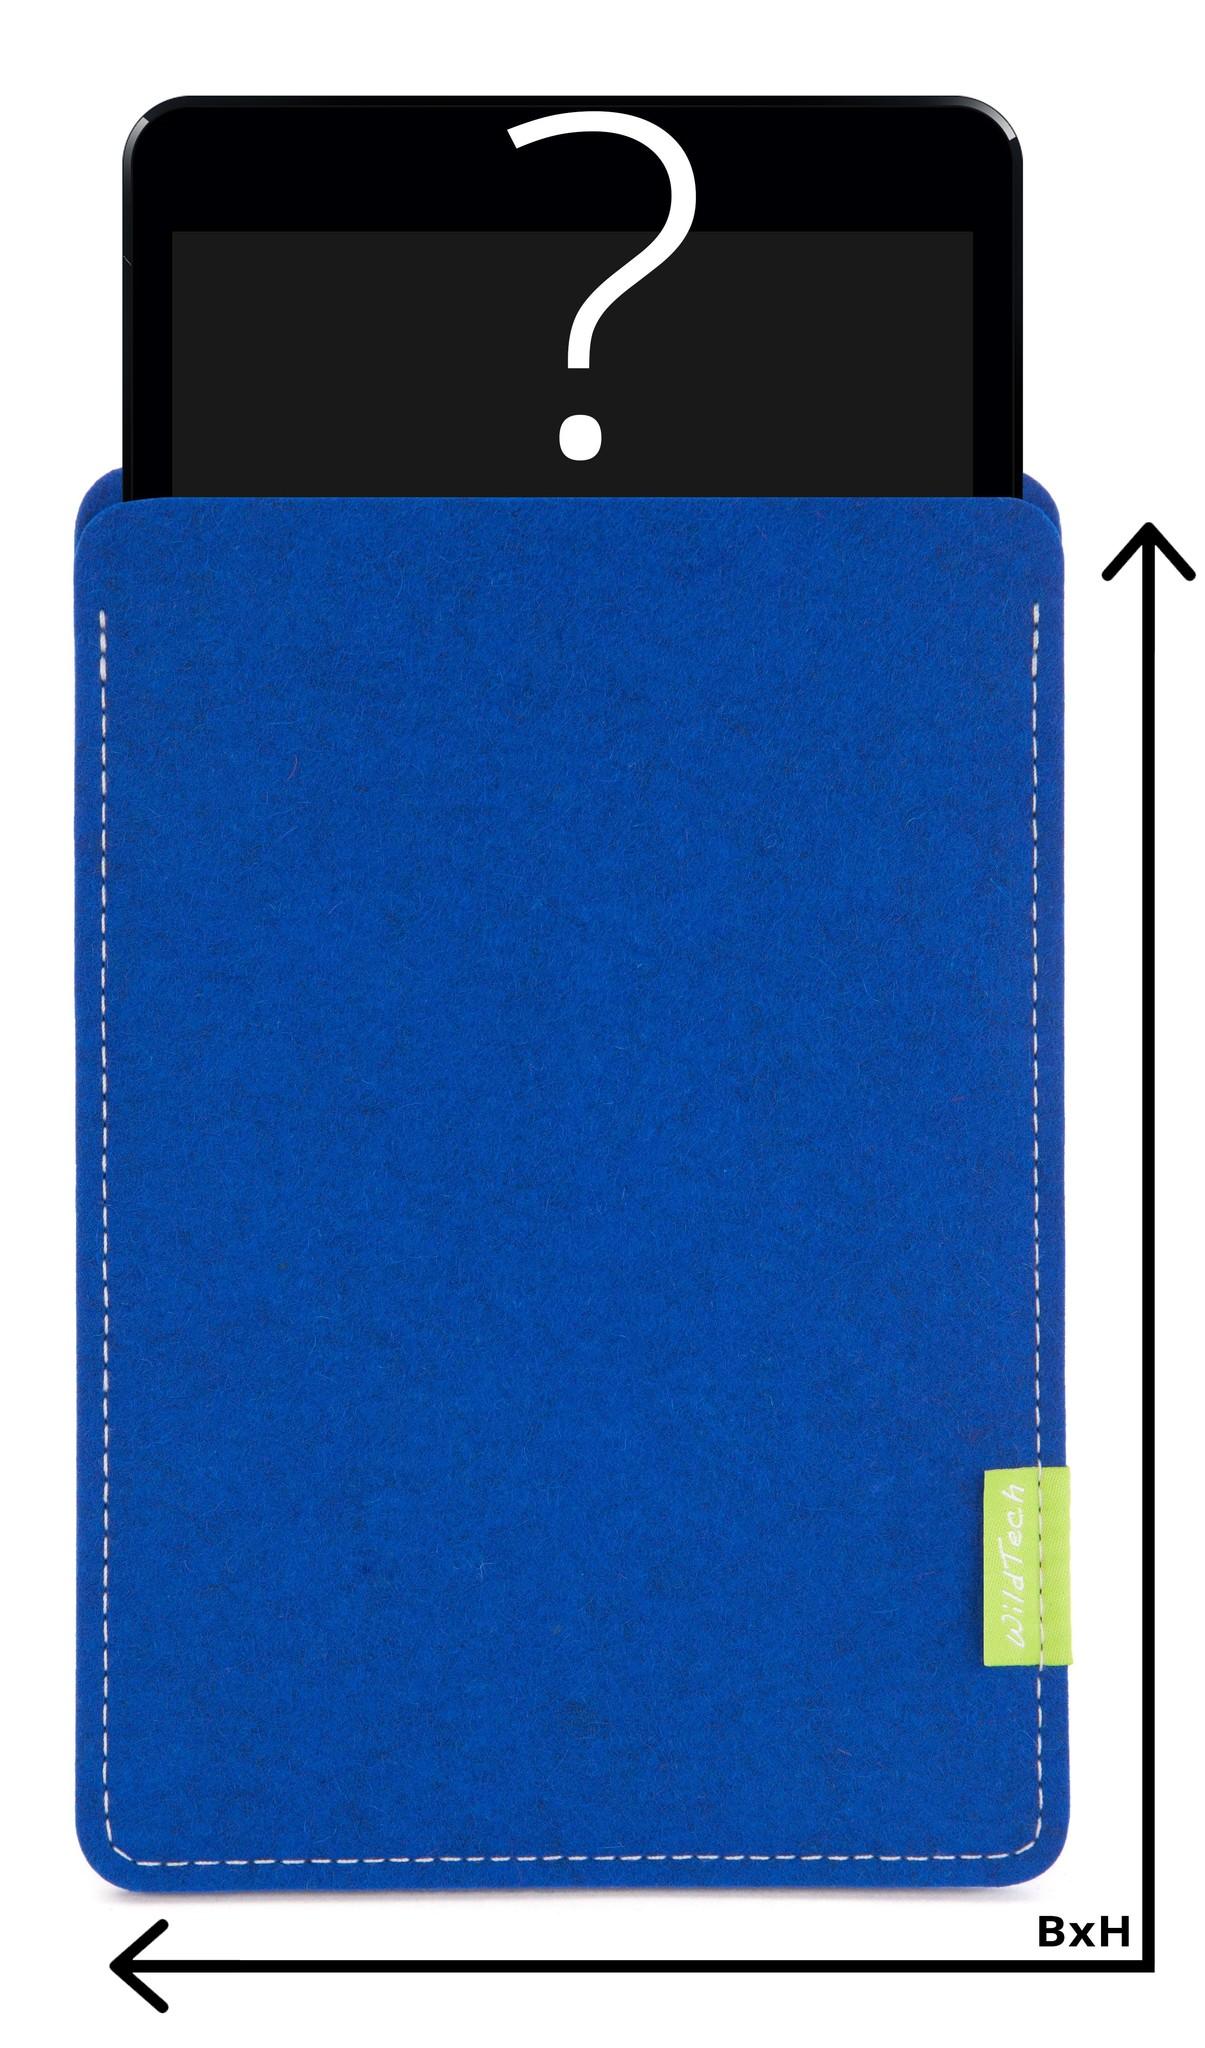 Individuelles Tablet Sleeve Azure-1